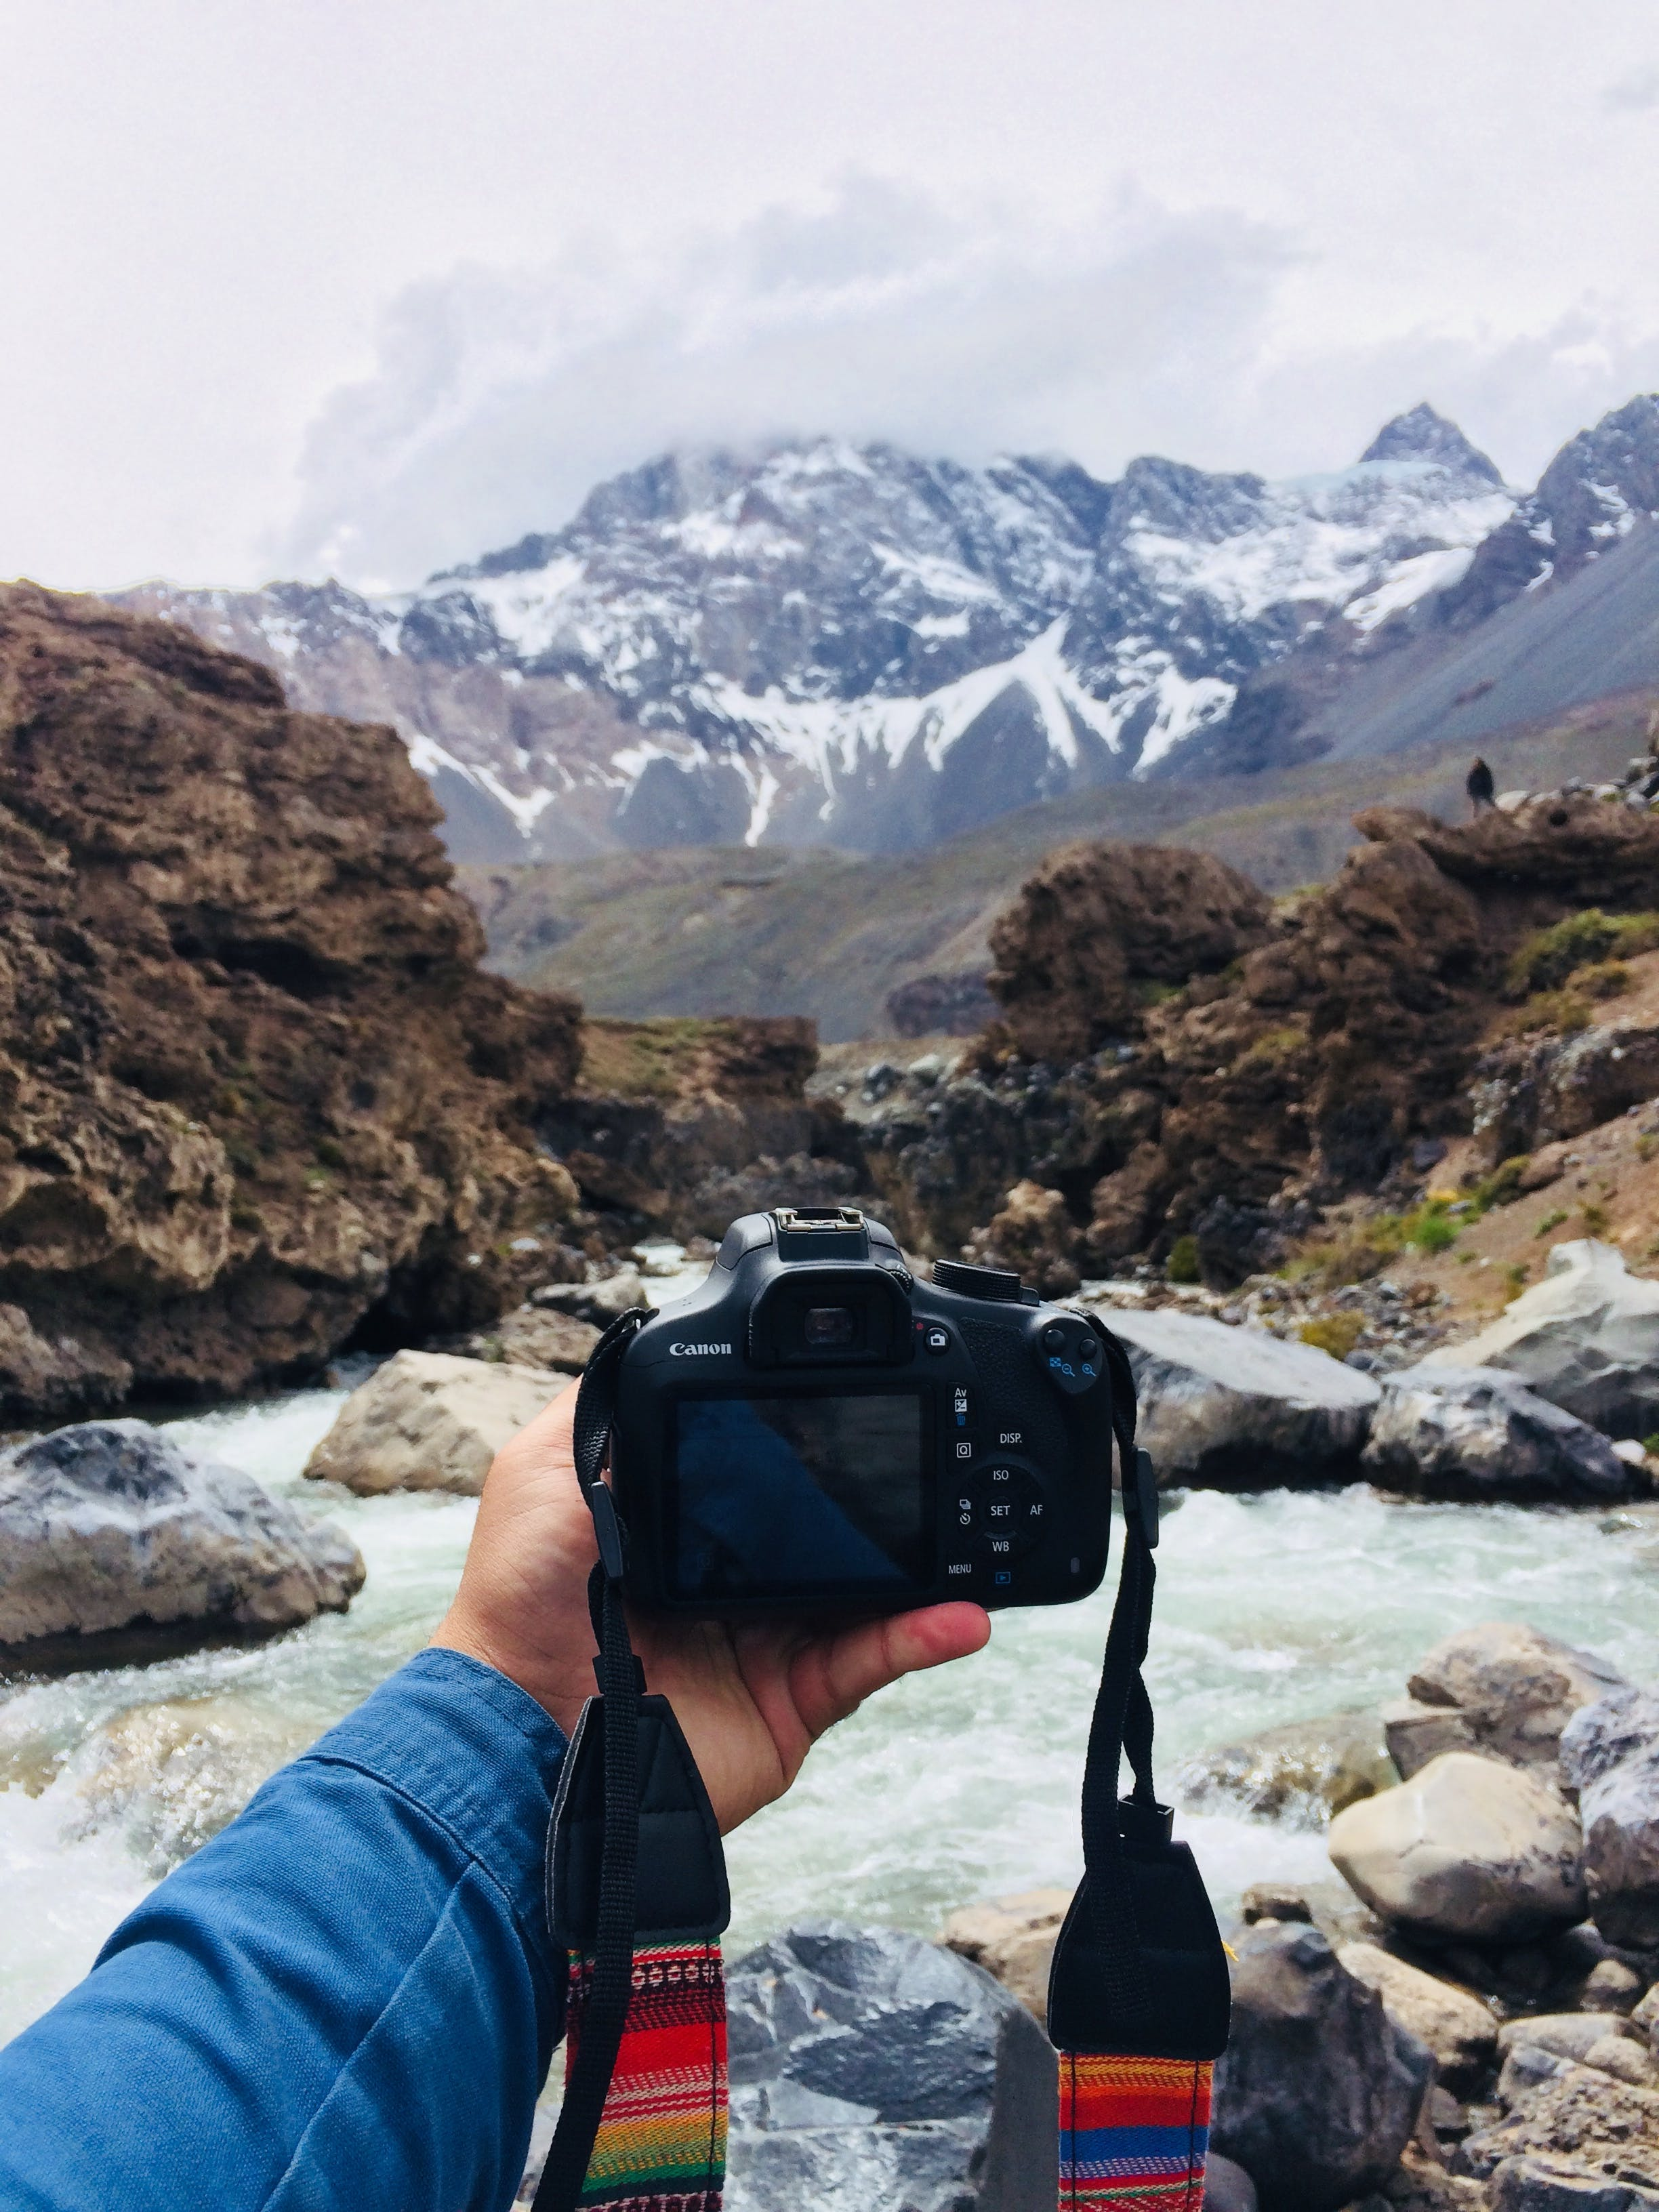 Black Canon Dslr Camera Facing the Mountains during Day